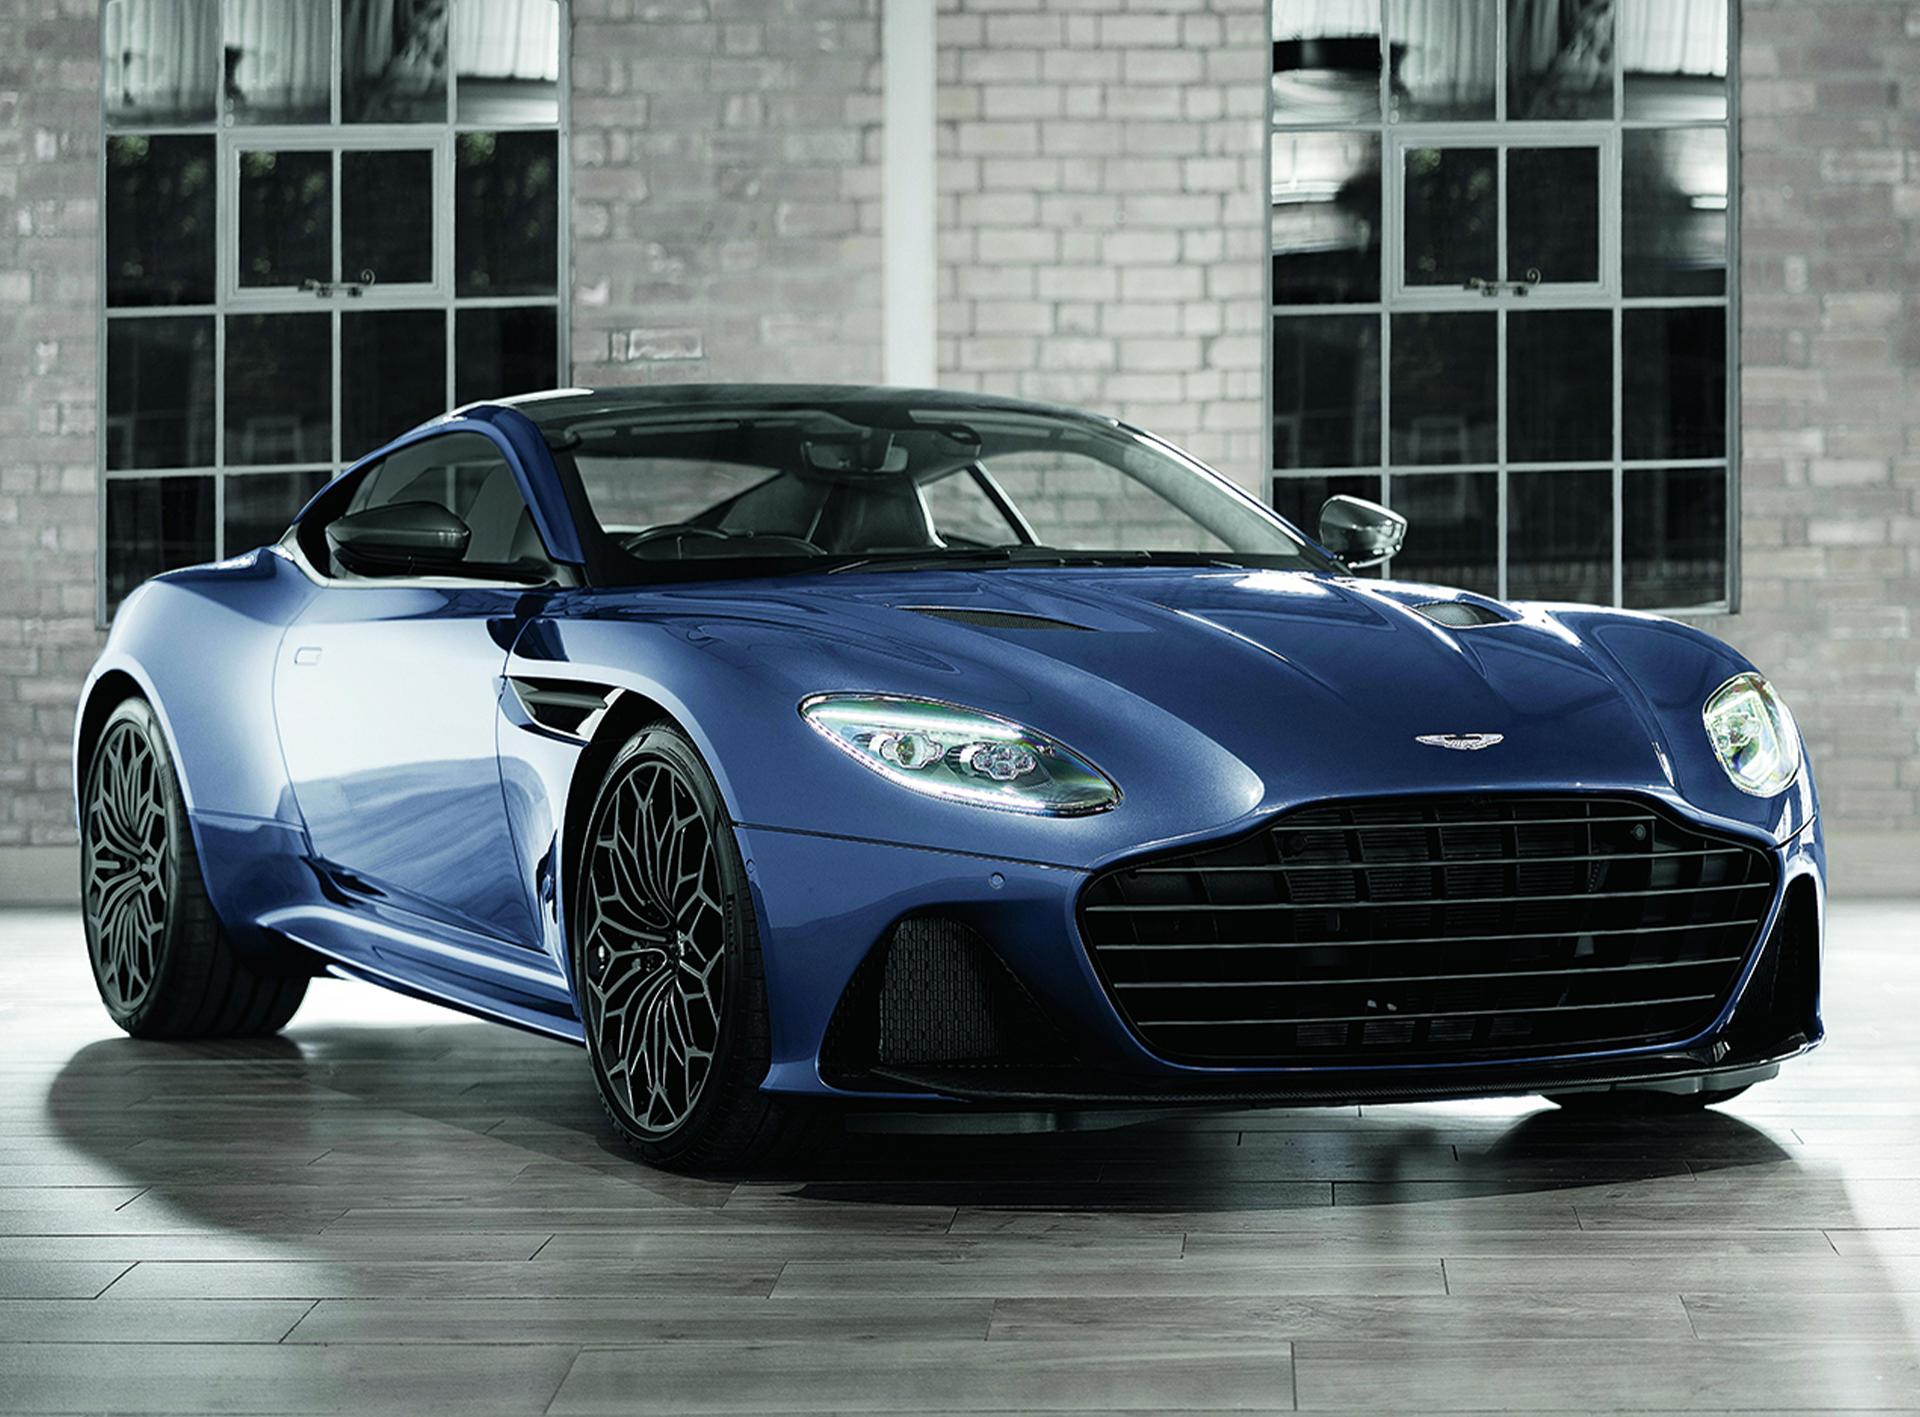 Own A Daniel Craig Designed Aston Martin James Bond 007